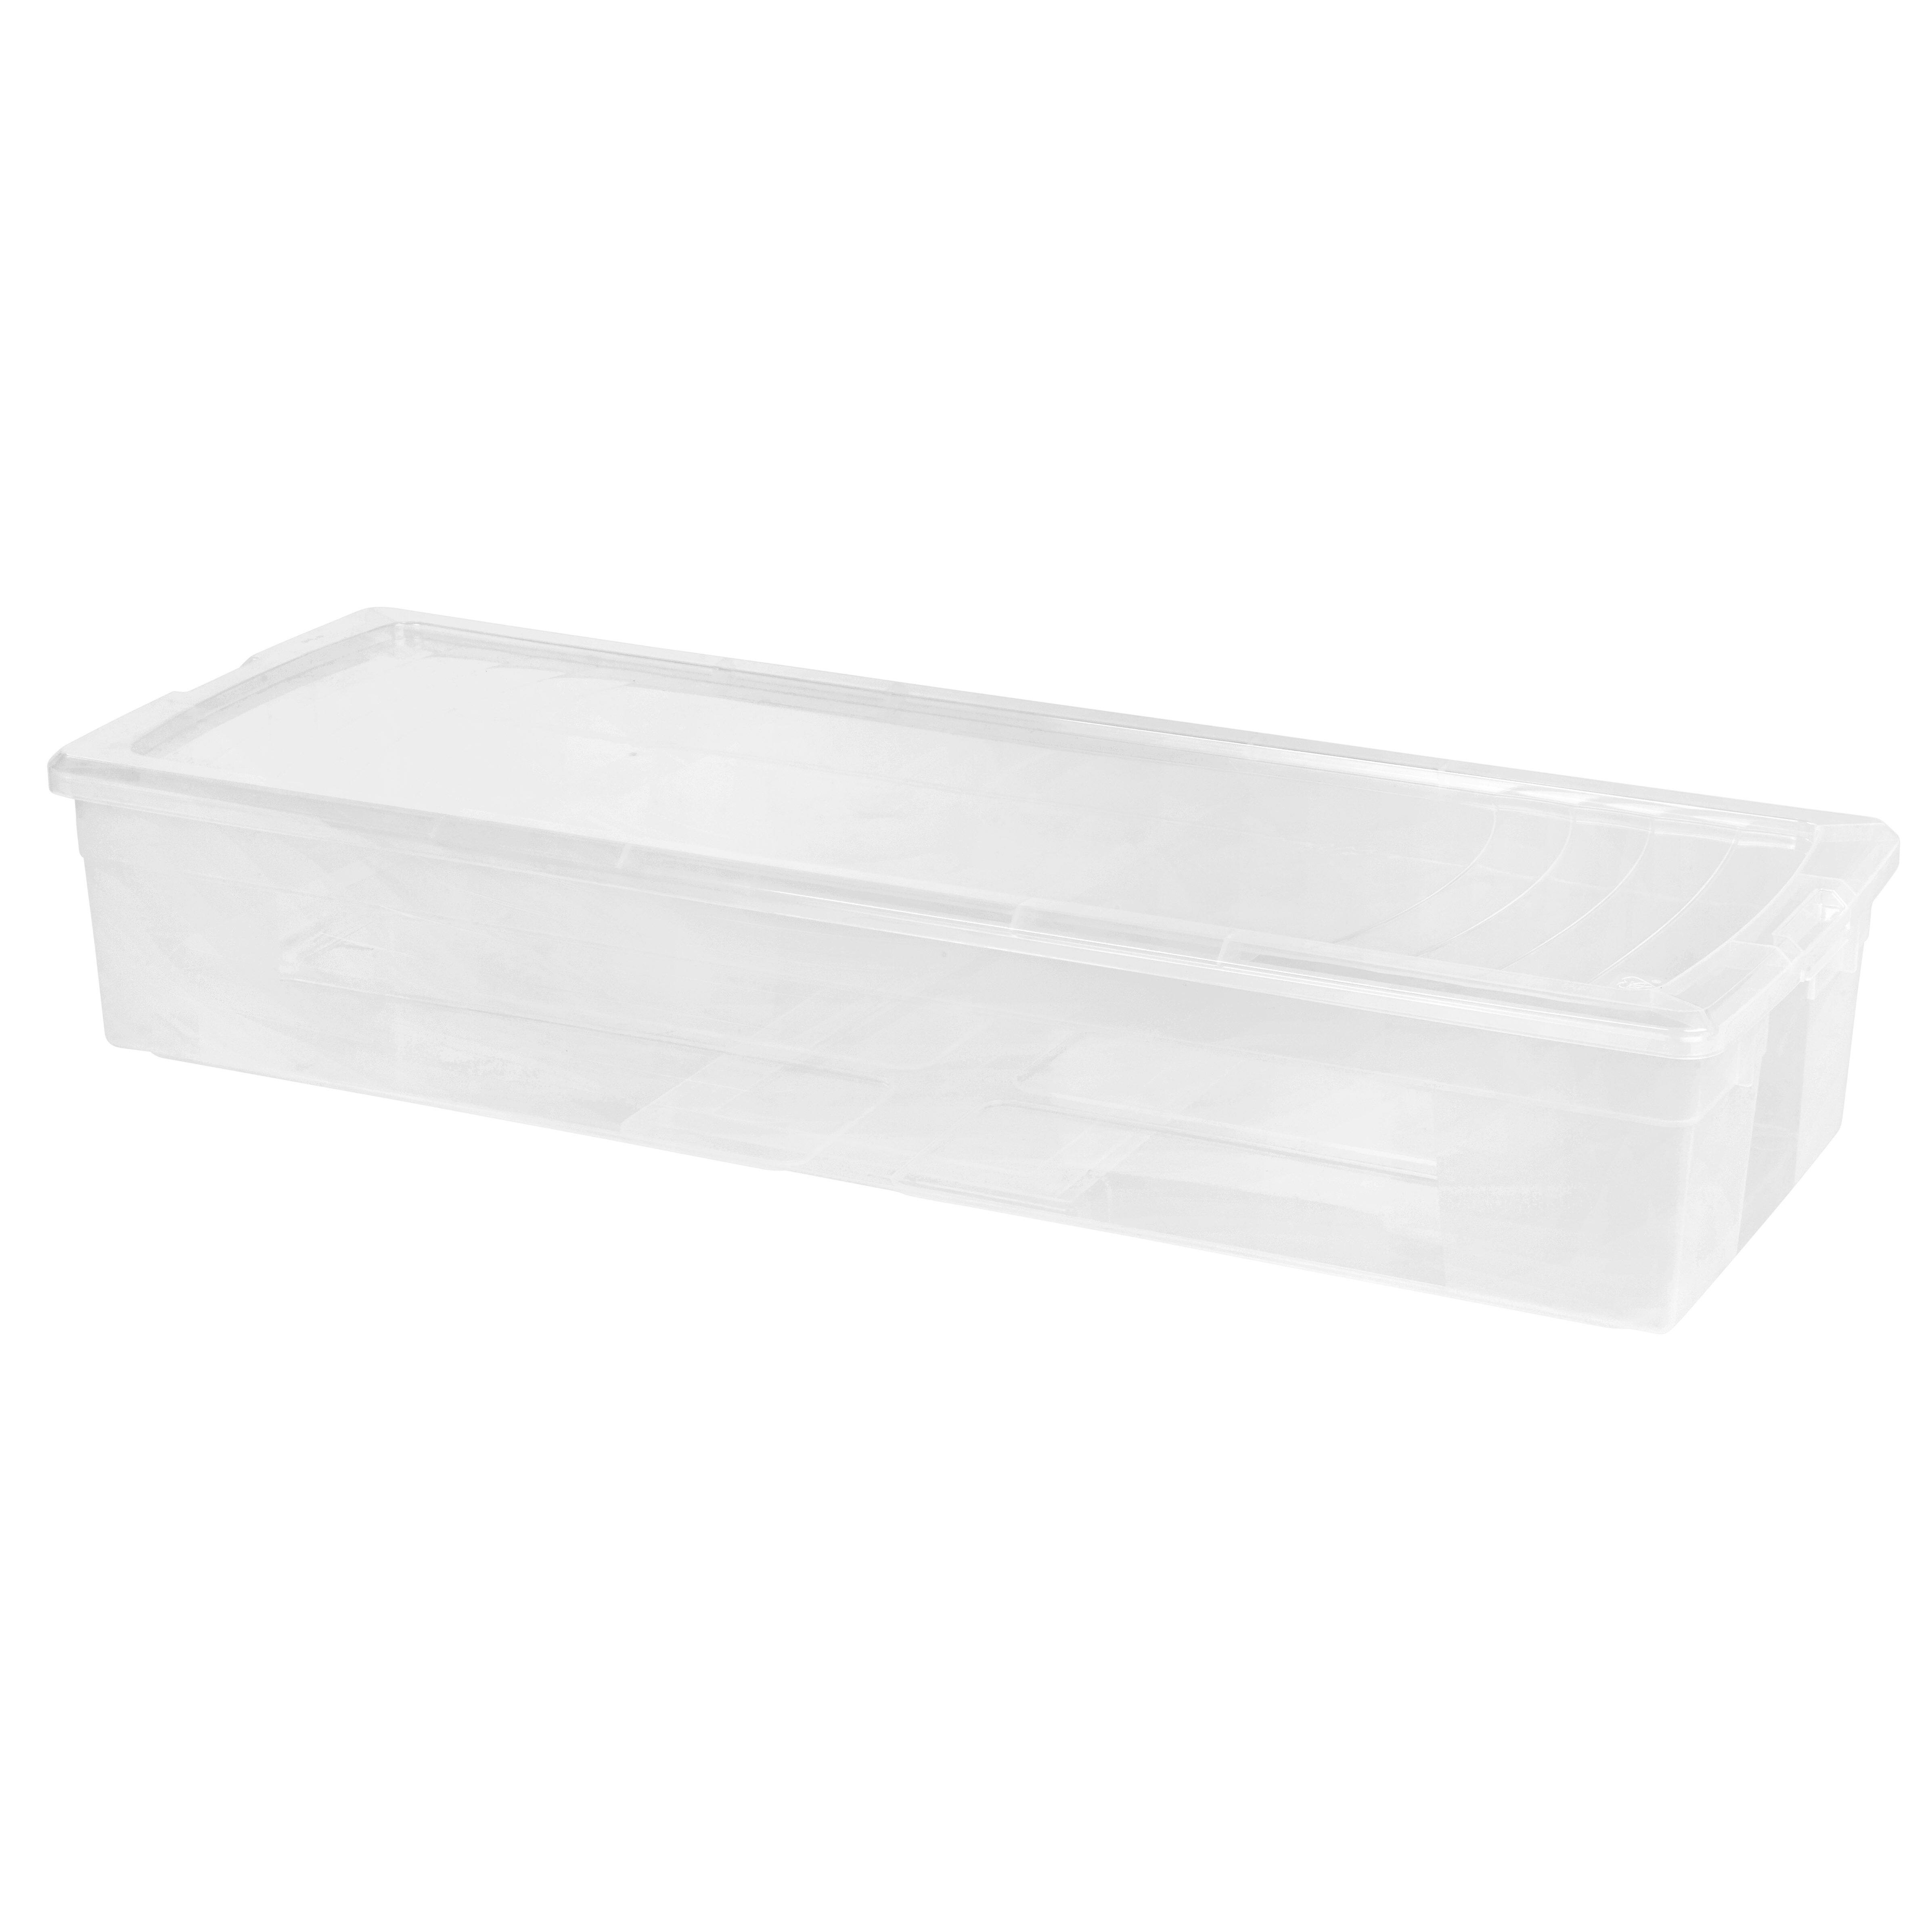 iris wrapping paper storage box reviews wayfair. Black Bedroom Furniture Sets. Home Design Ideas